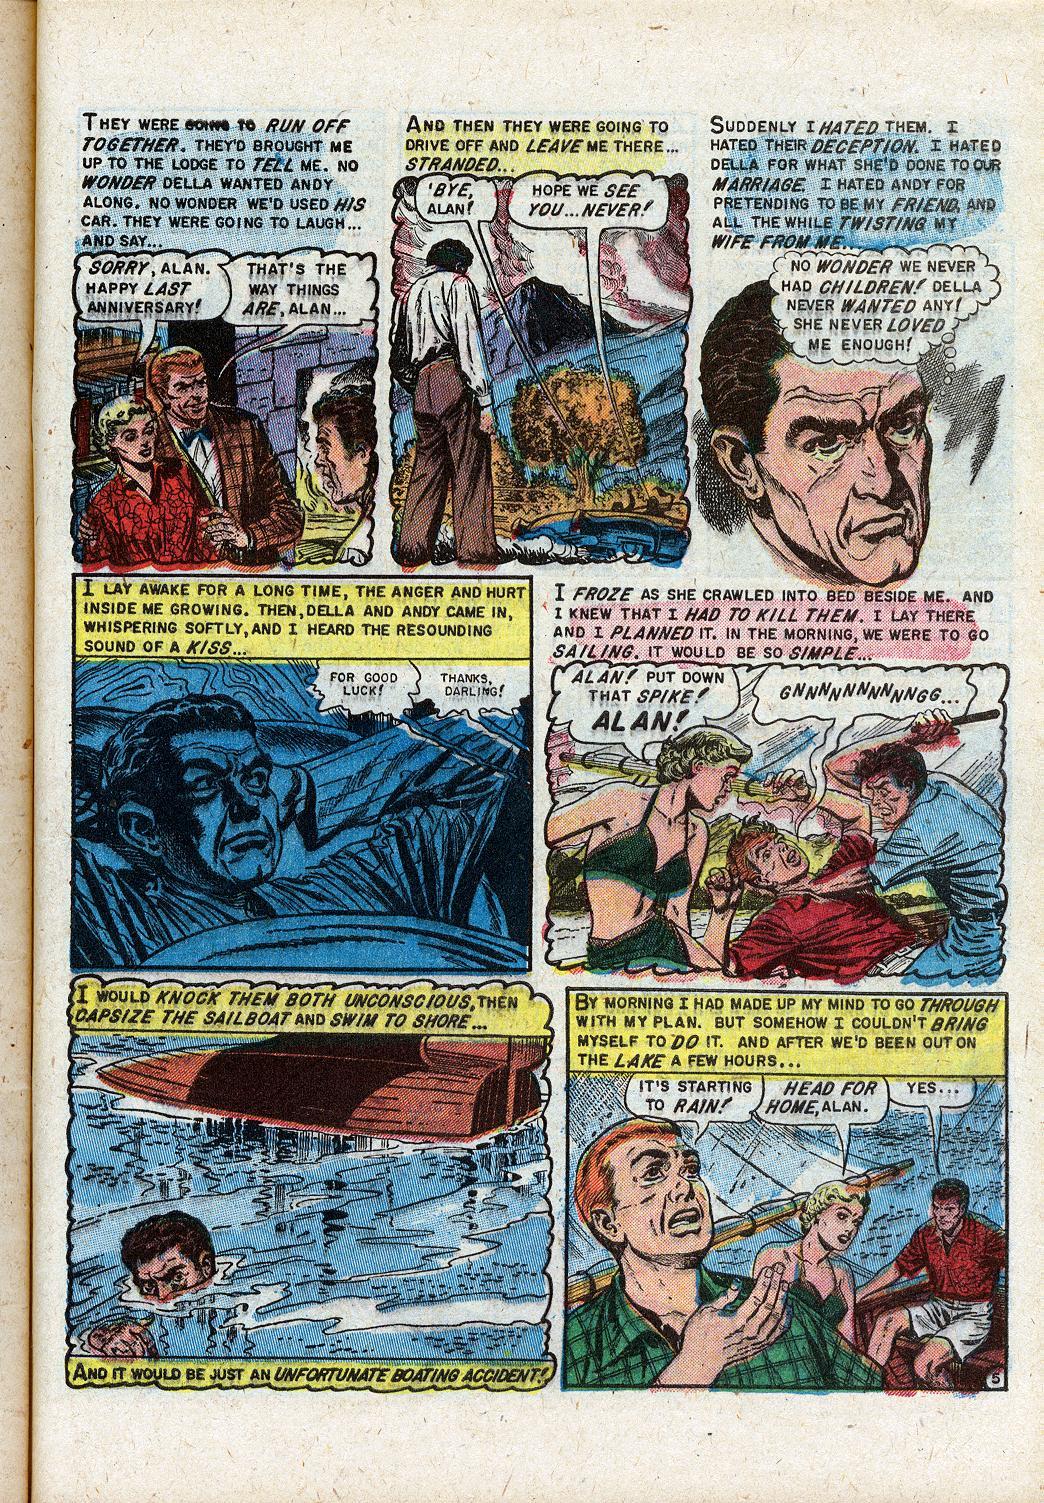 Read online Shock SuspenStories comic -  Issue #11 - 31